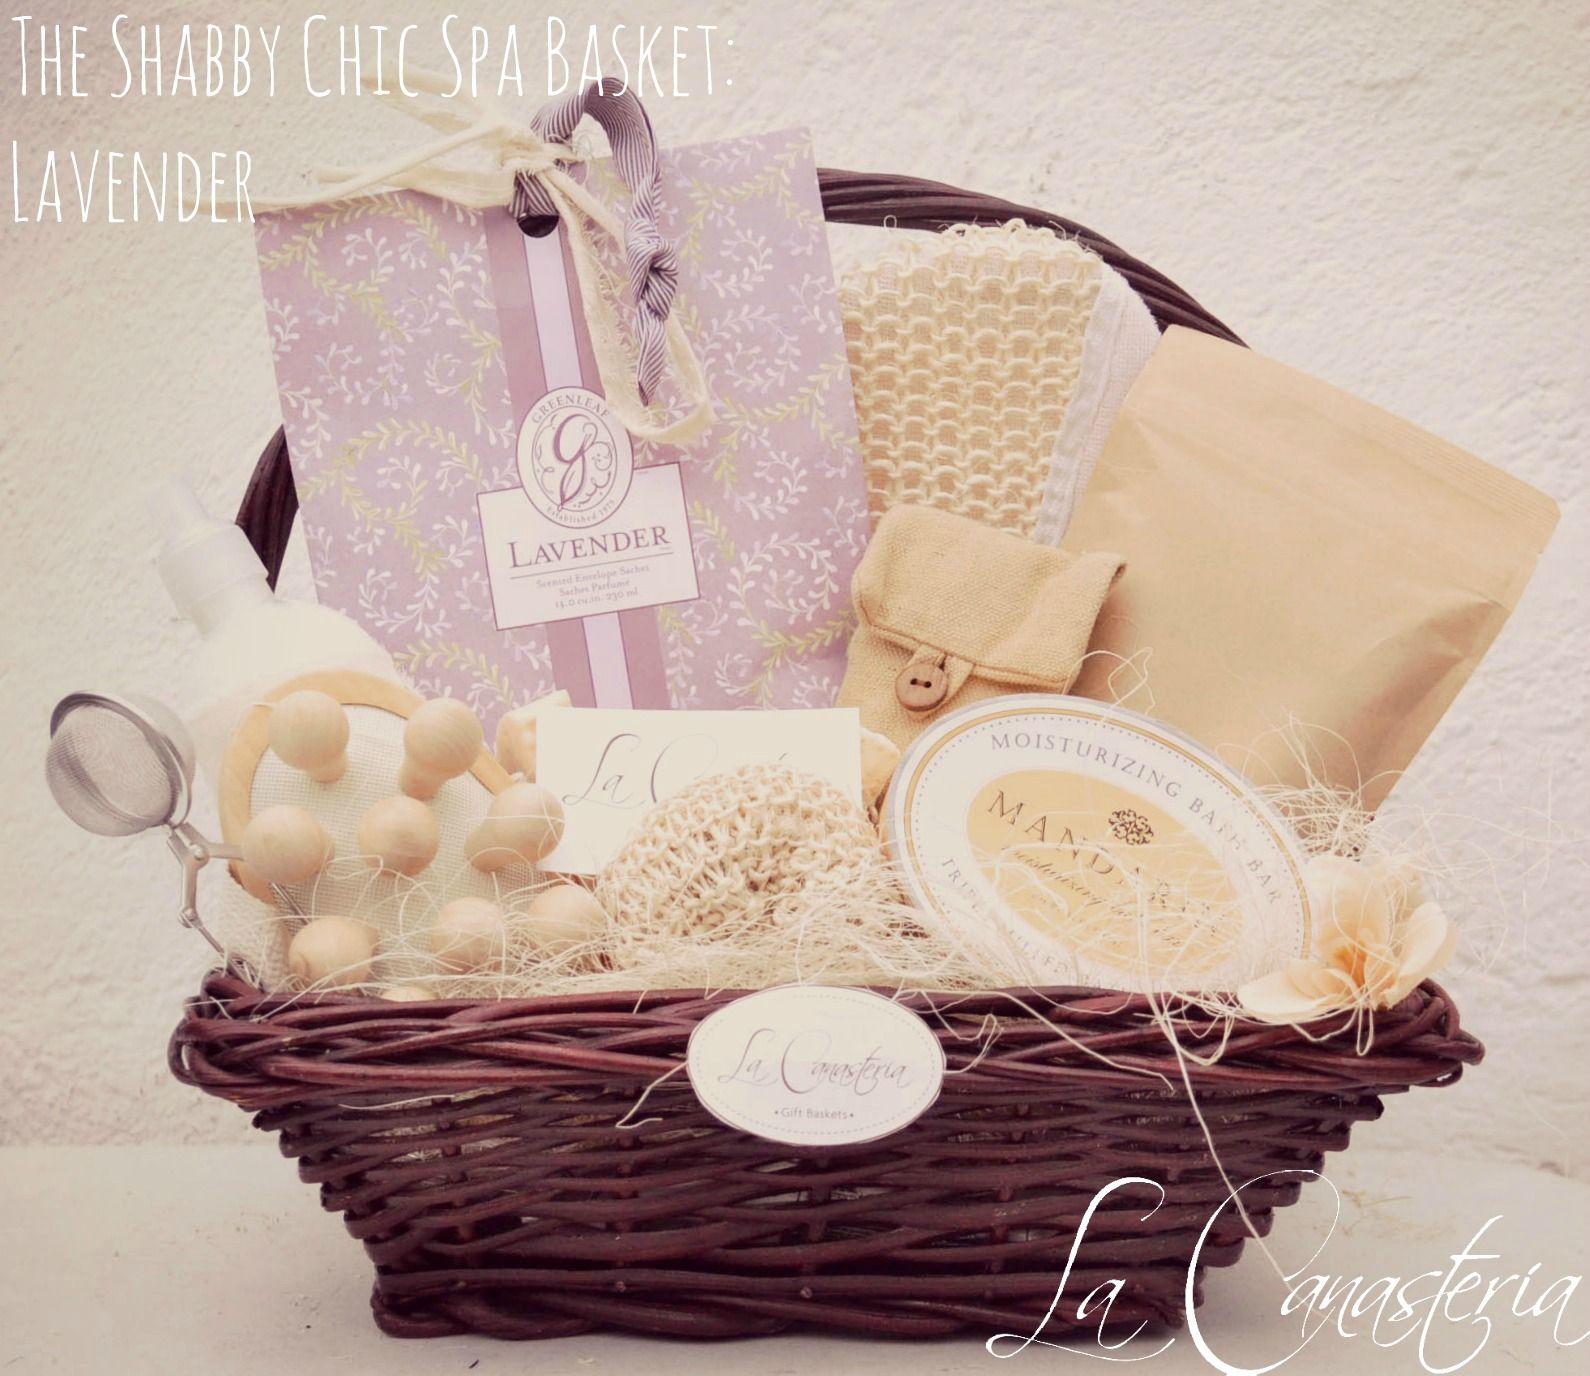 The shabby chic spa basket lavender spa basket spa and - Navidad shabby chic ...